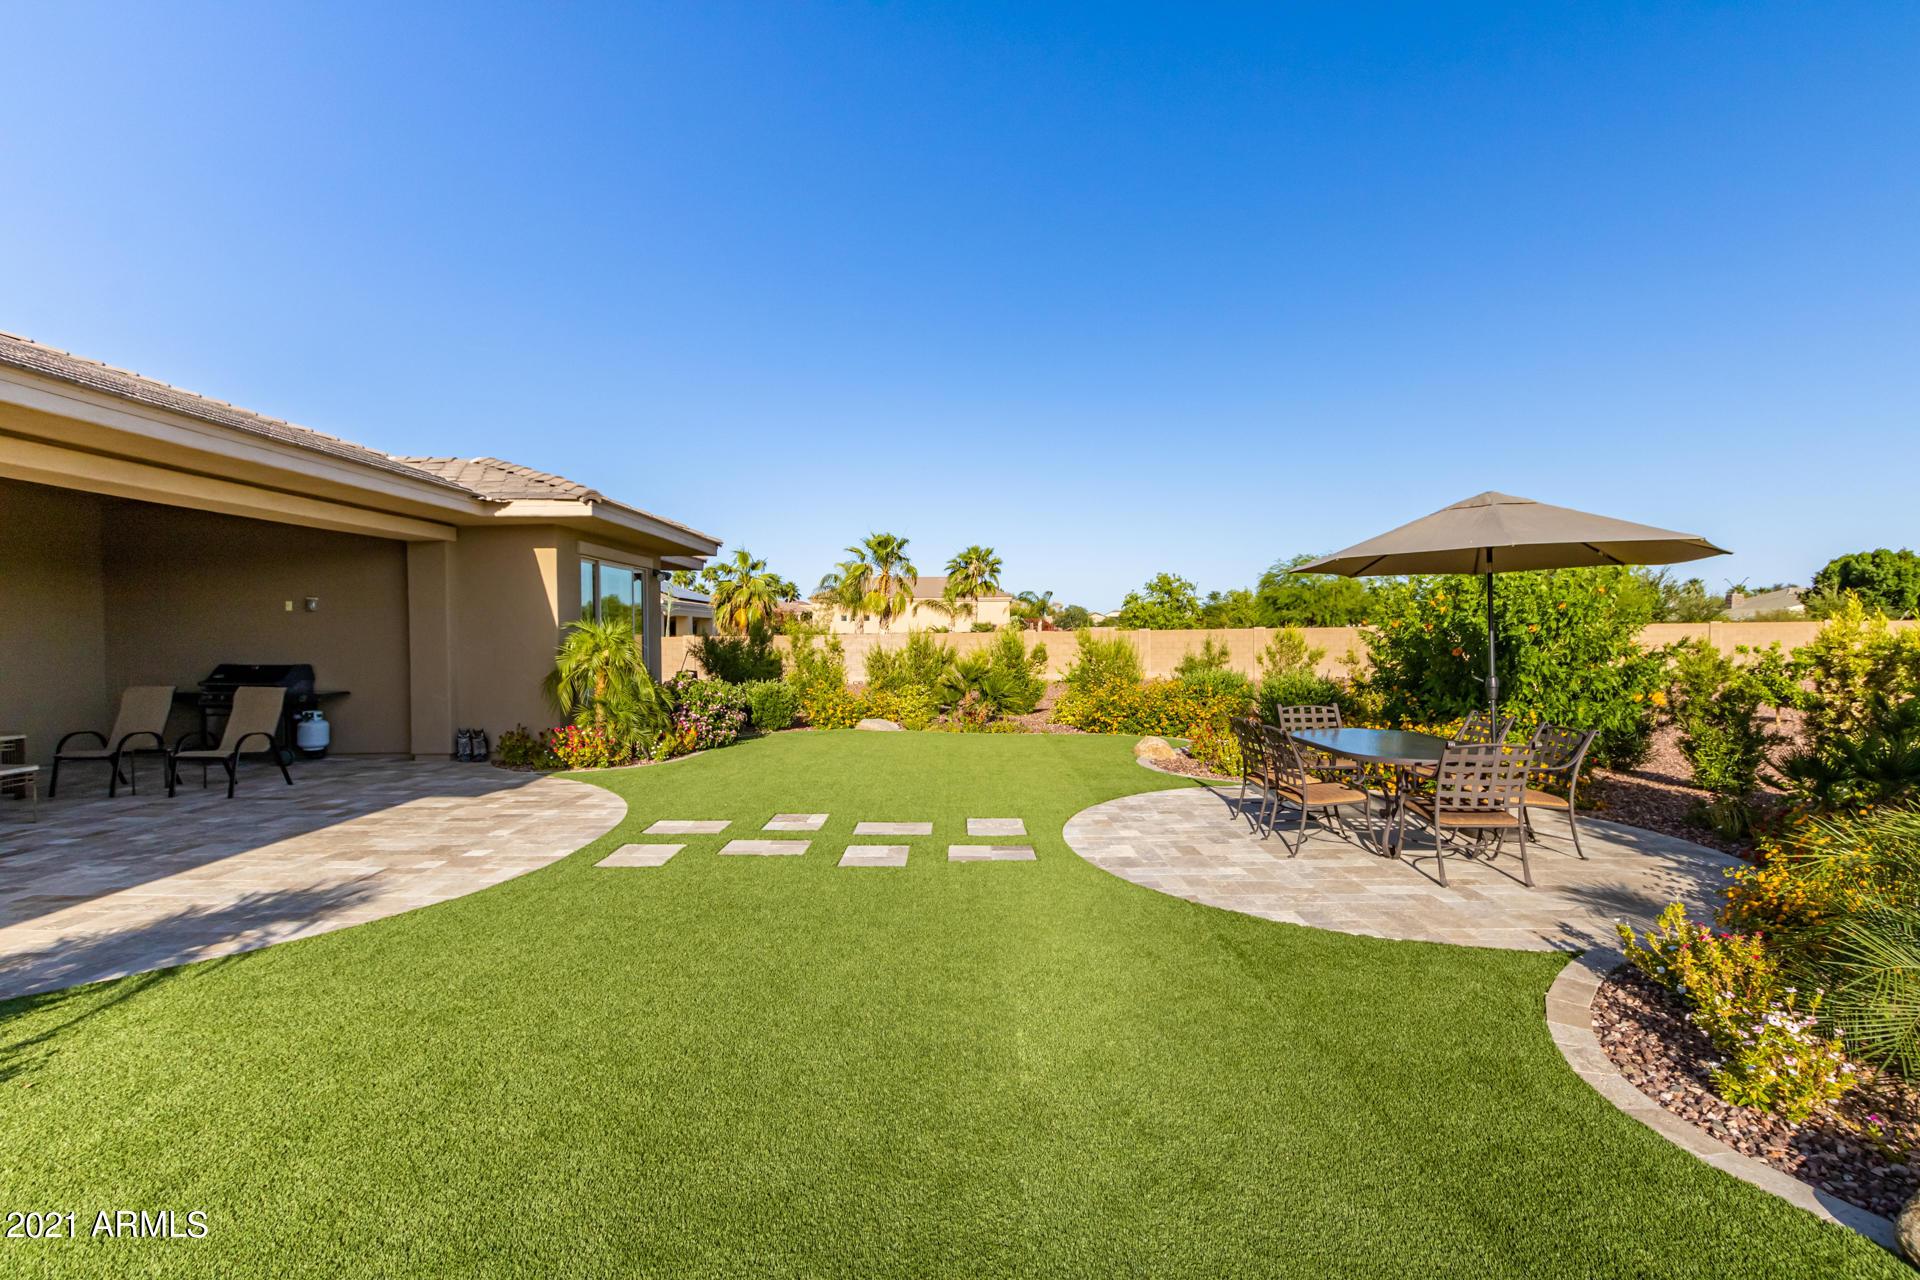 MLS 6235249 16393 W Durango Street, Goodyear, AZ 85338 Goodyear AZ Luxury